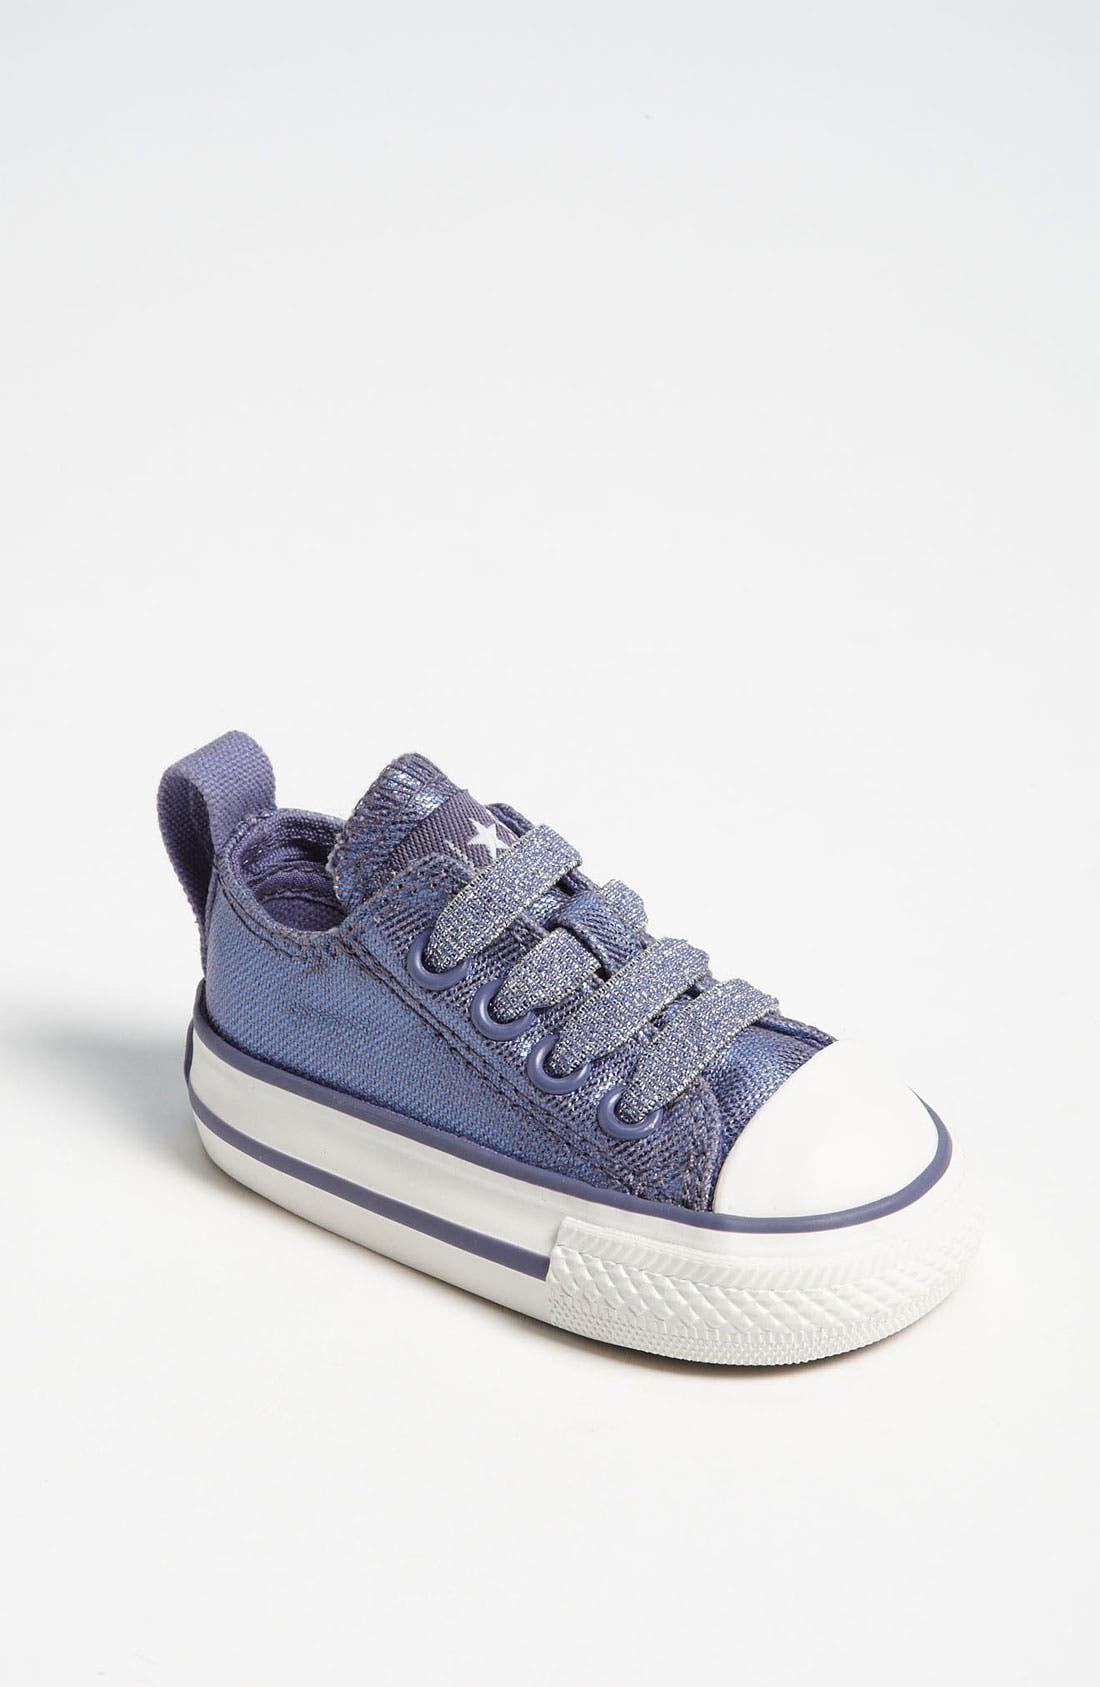 Main Image - Converse 'Shimmer' Slip-On Sneaker (Baby, Walker, Toddler, Little Kid & Big Kid)